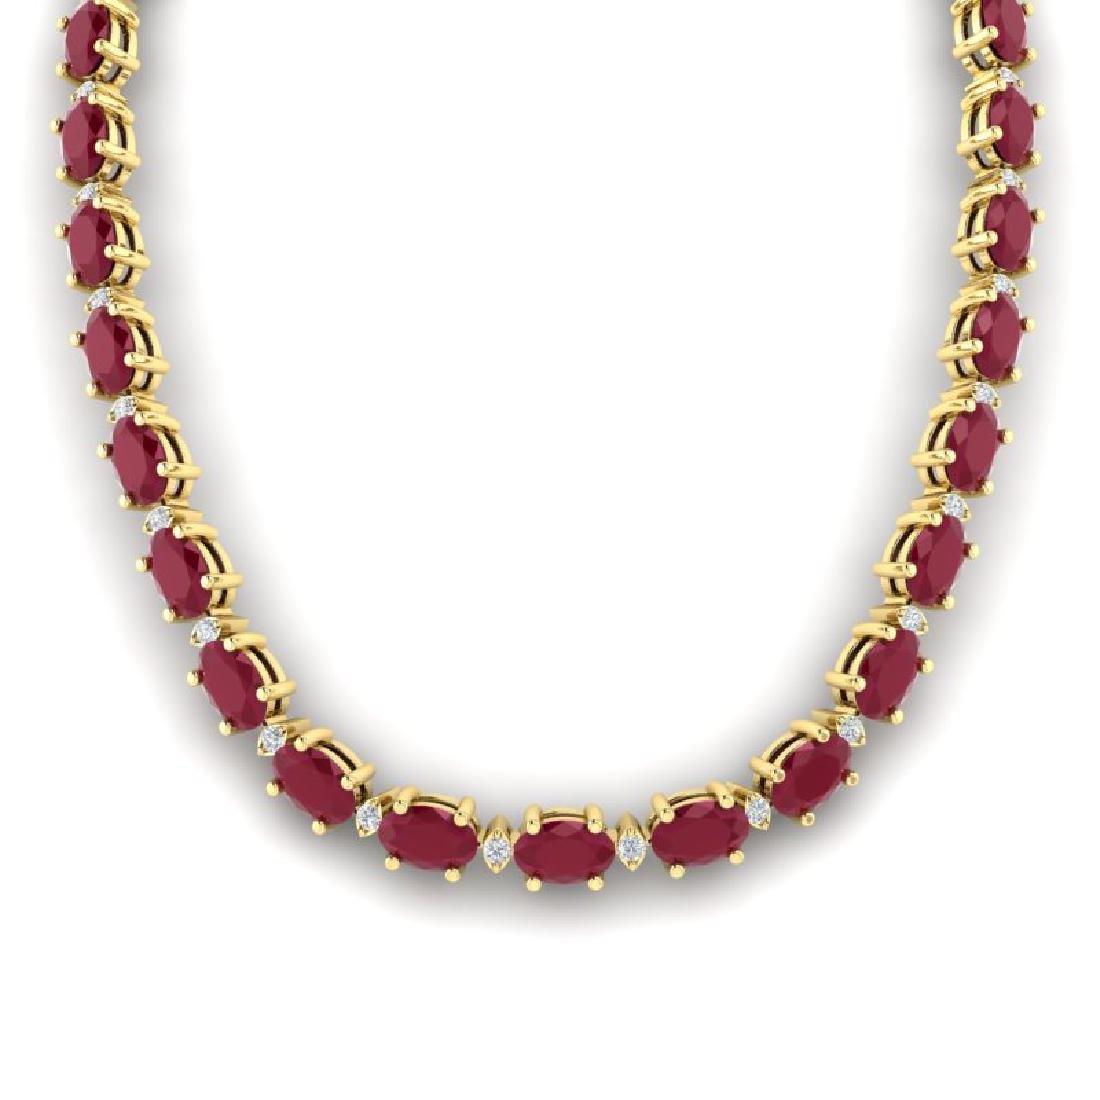 35 CTW Ruby & VS/SI Diamond Eternity Tennis Necklace - 3